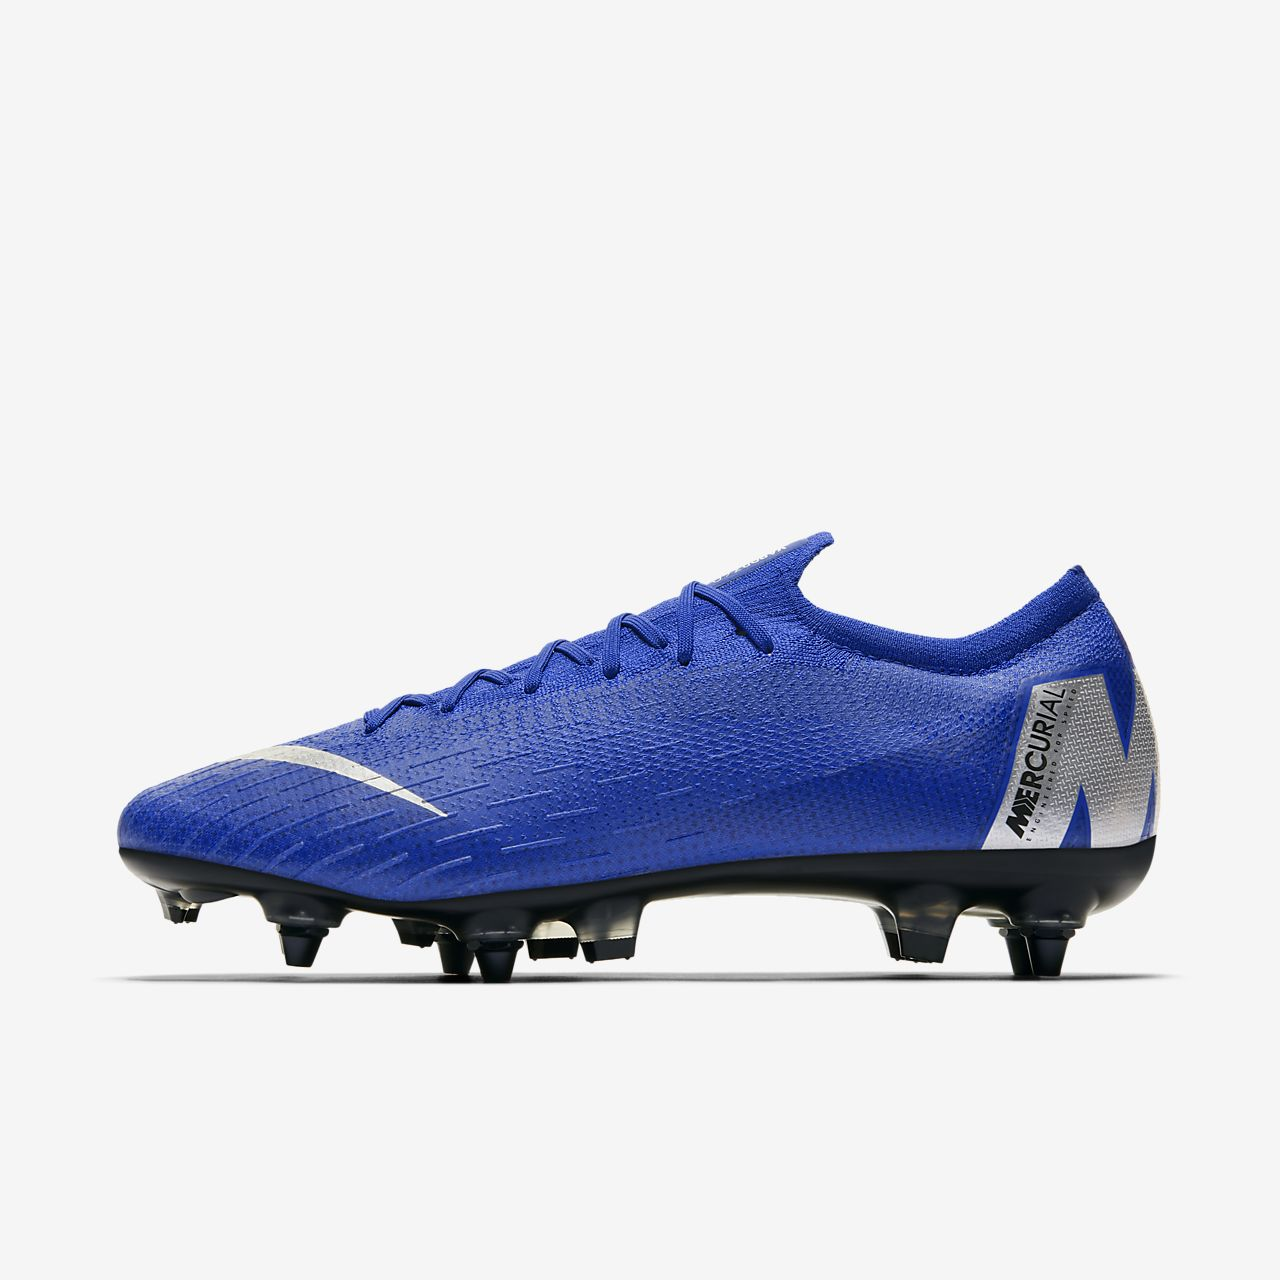 Nike Mercurial Vapor 360 Elite SG-PRO Anti-Clog Soft-Ground Football Boot